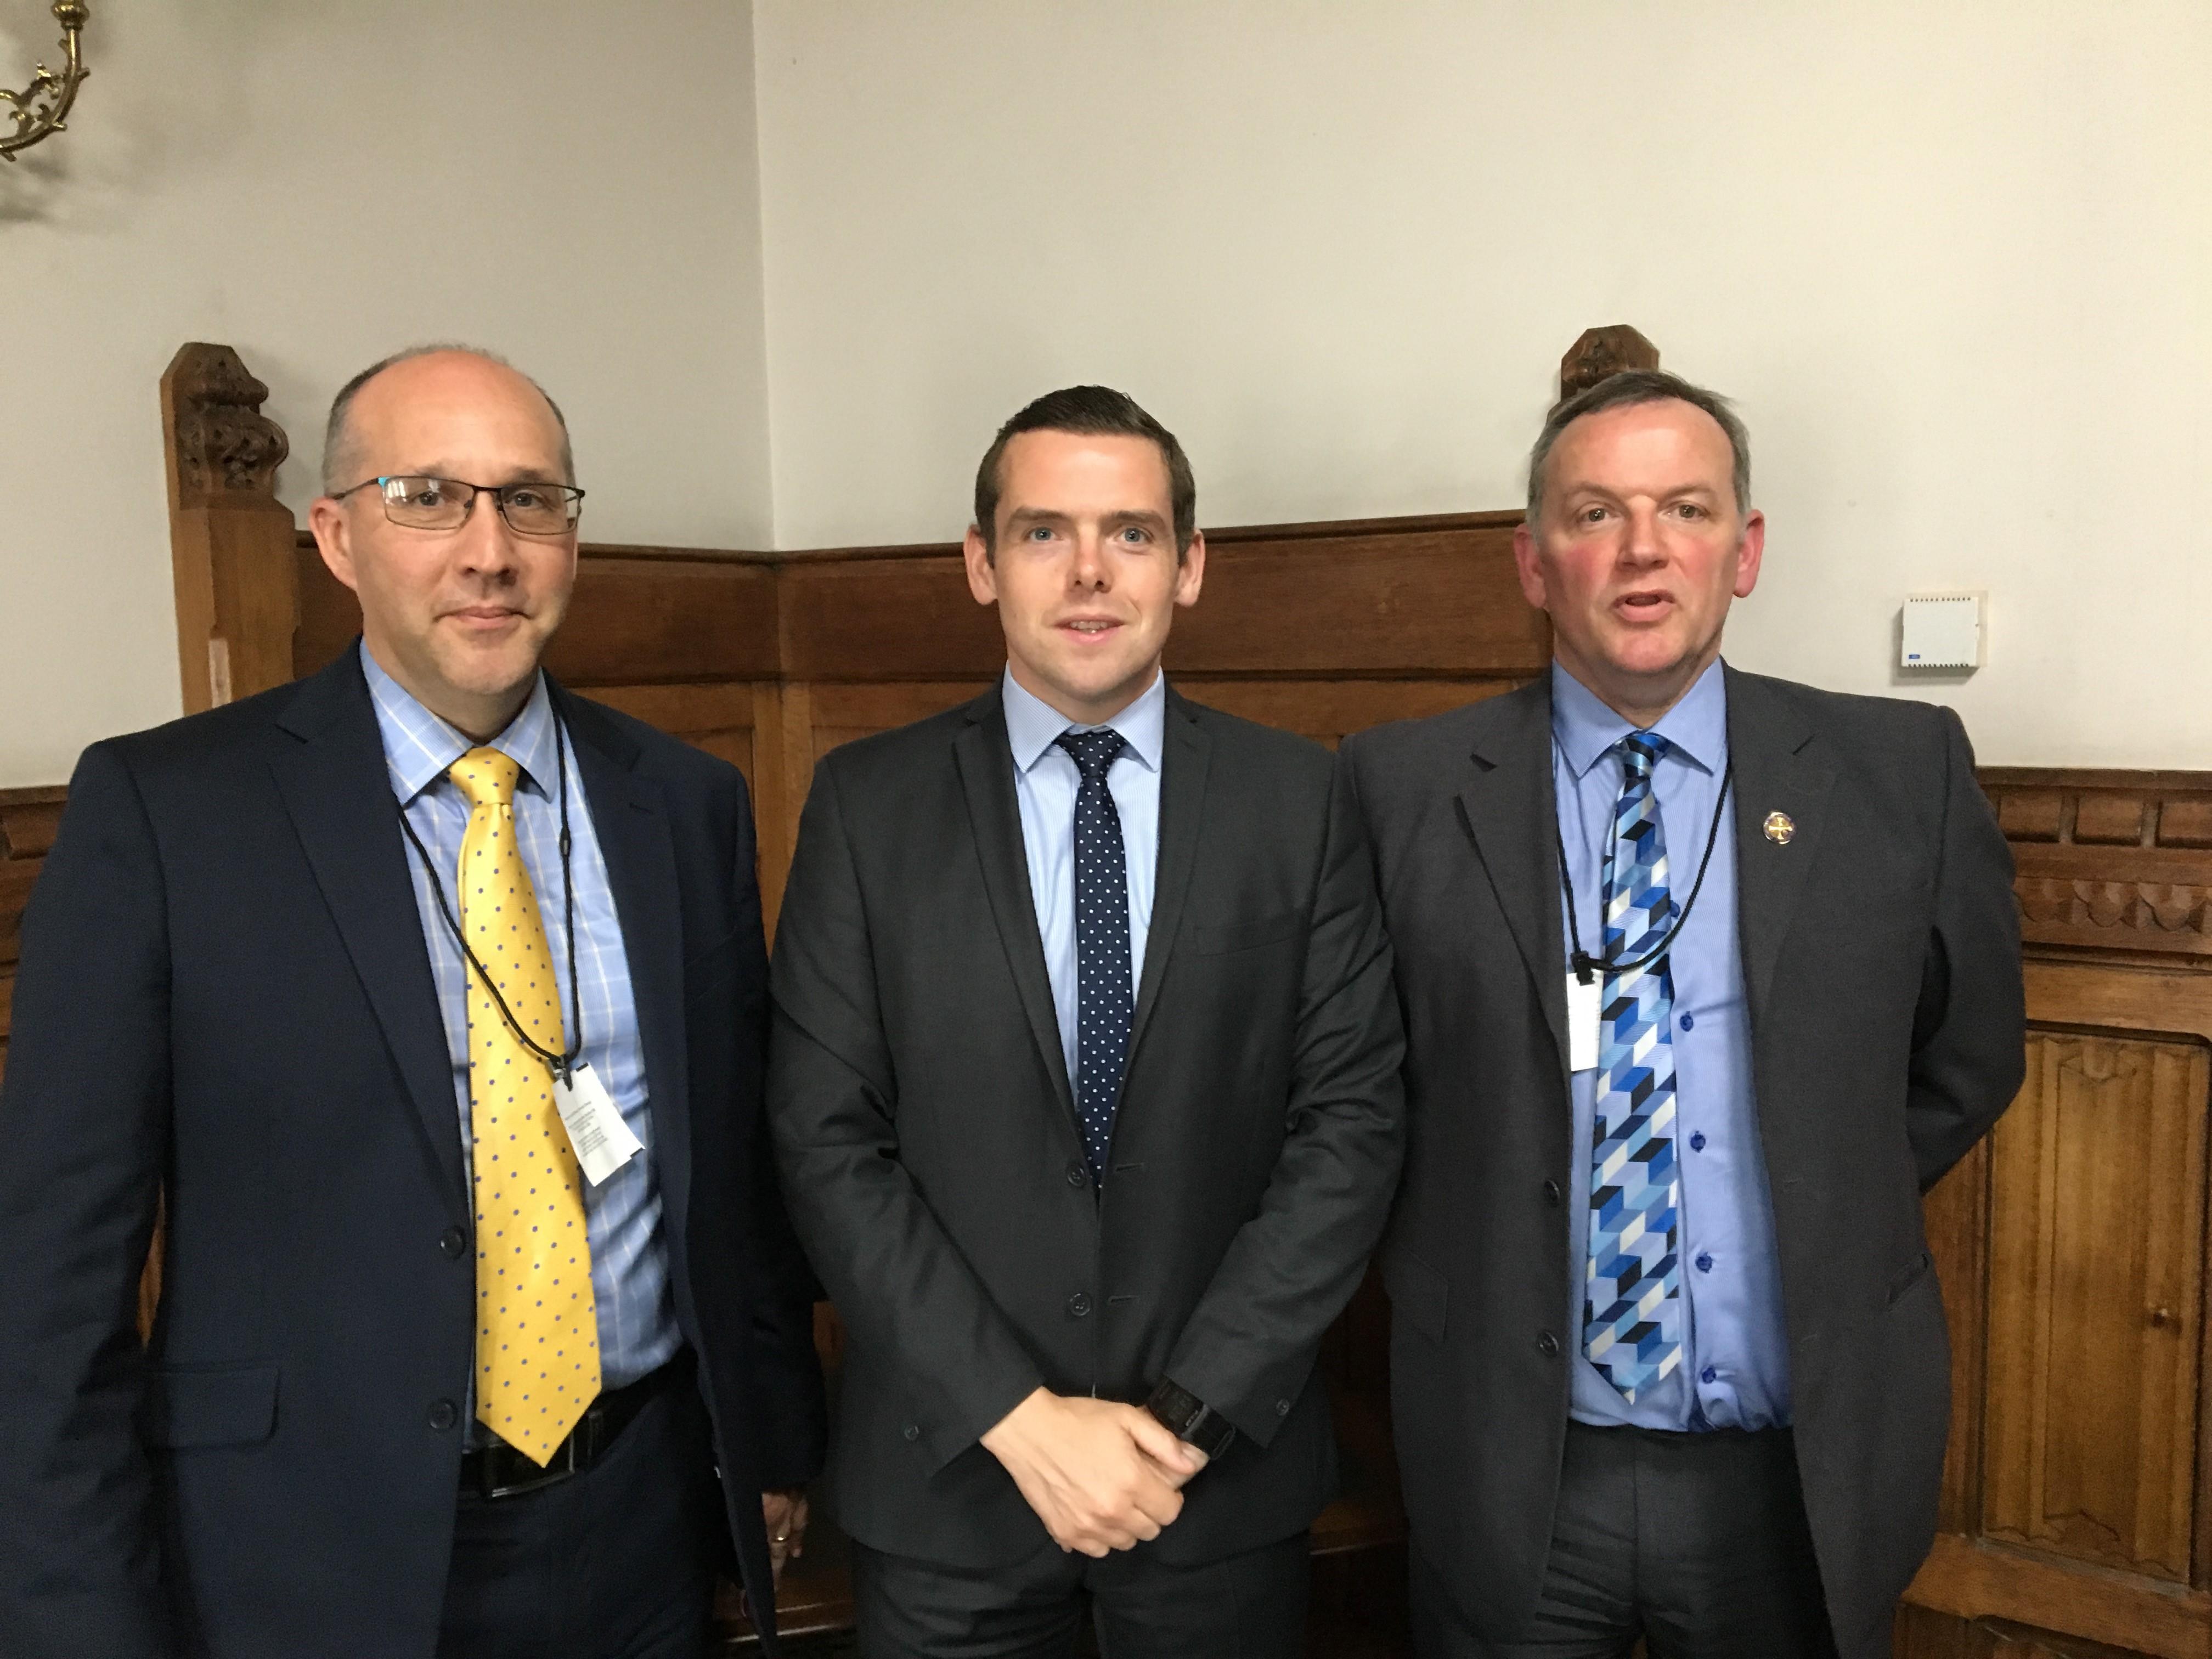 Calum Greenhow, chief executive of the National Federation of Subpostmasters, Moray MP Douglas Ross and Moray-based subpostmaster Paul McBain.